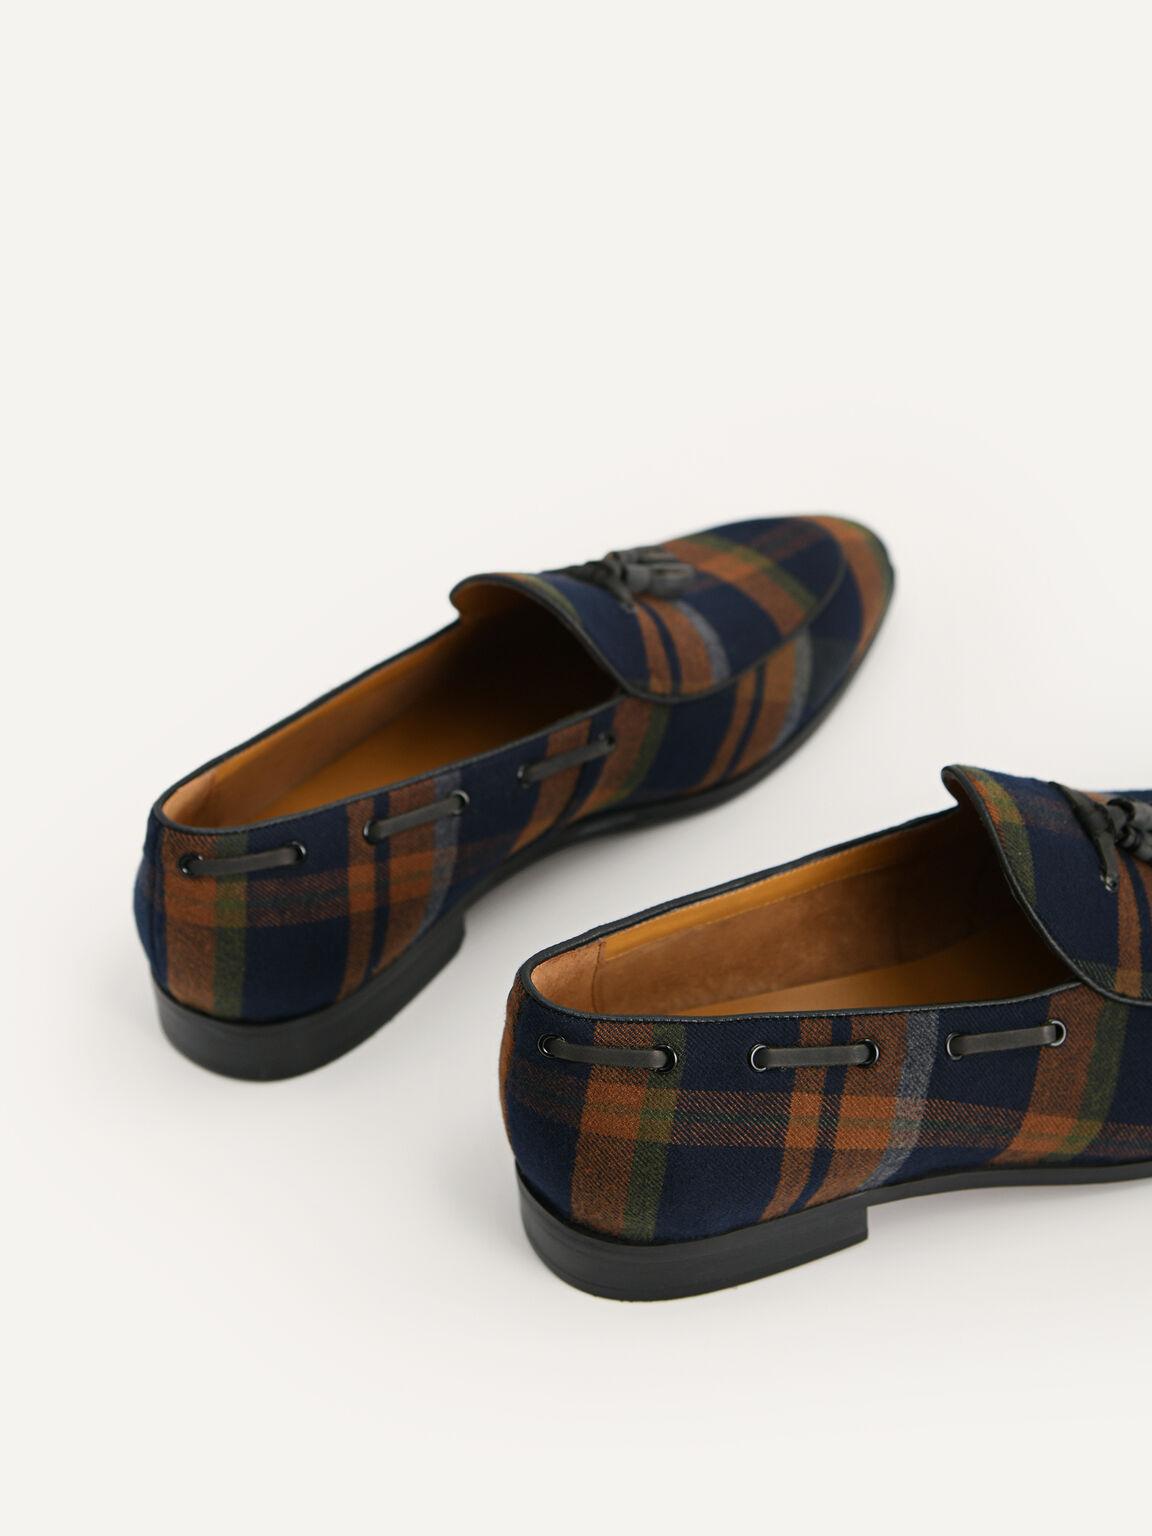 Striped Tasselled Loafers, Multi, hi-res